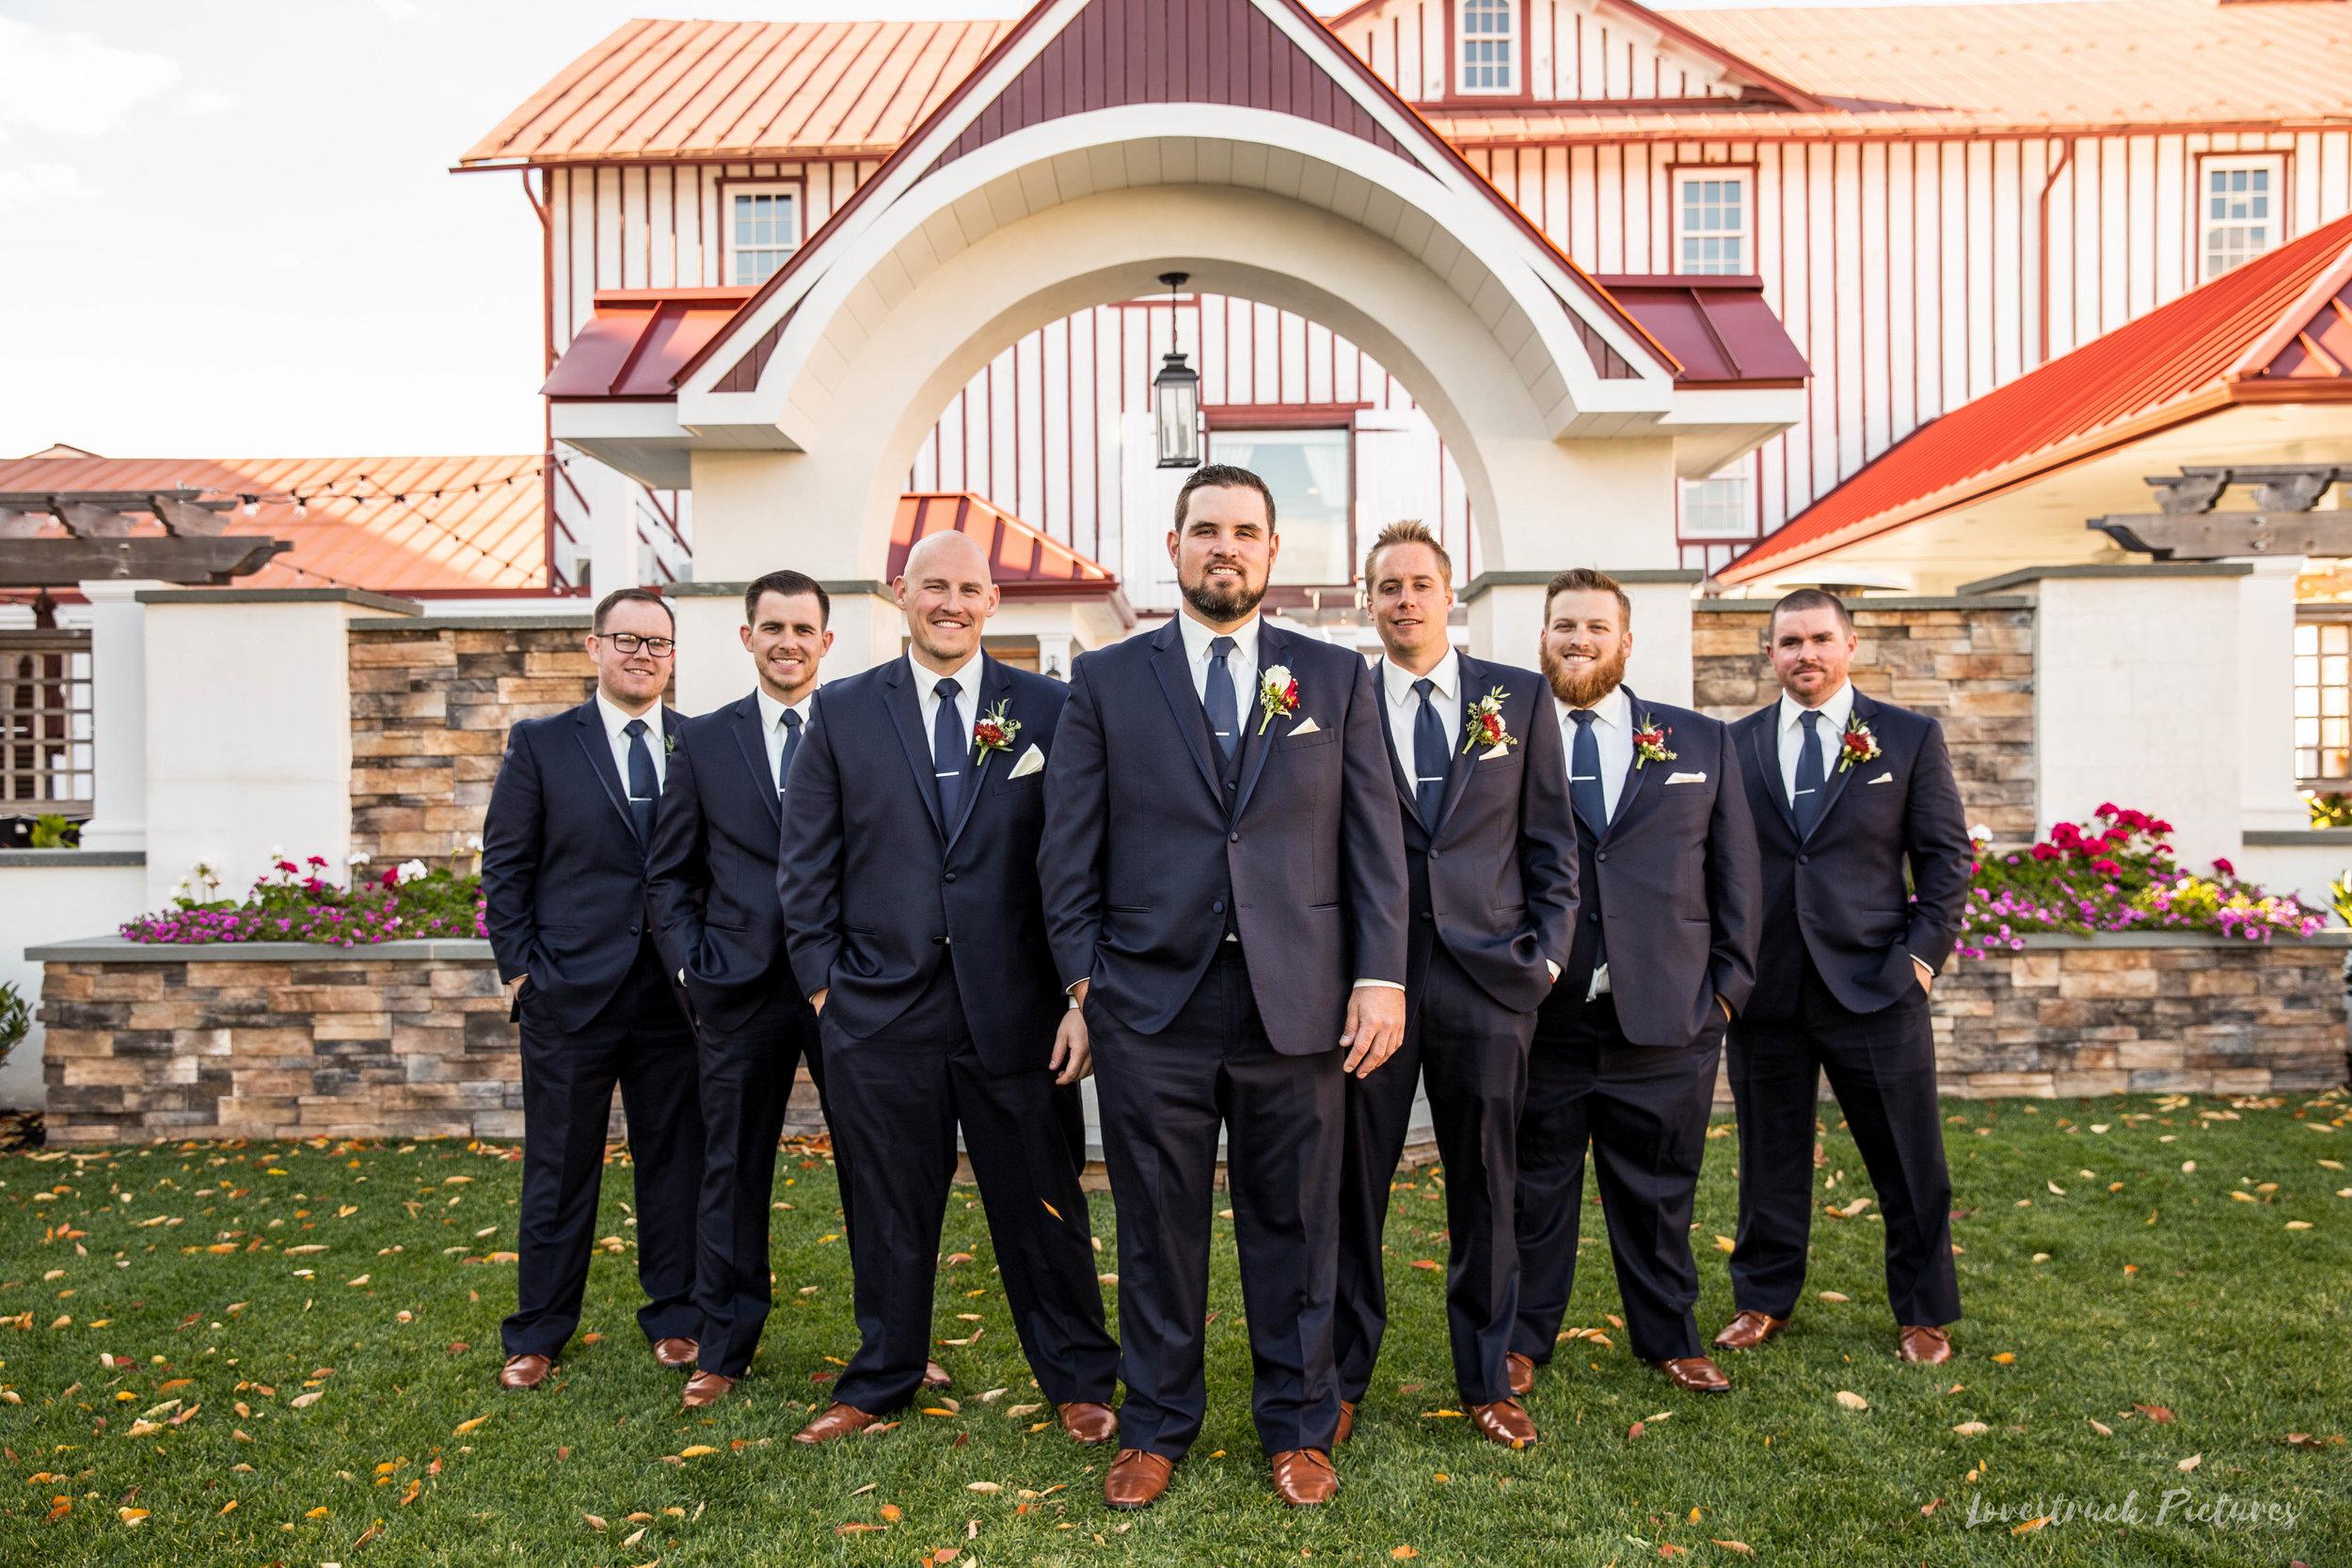 NORMANDY_FARMS_WEDDING_BLUEBELL_PA--15.jpg